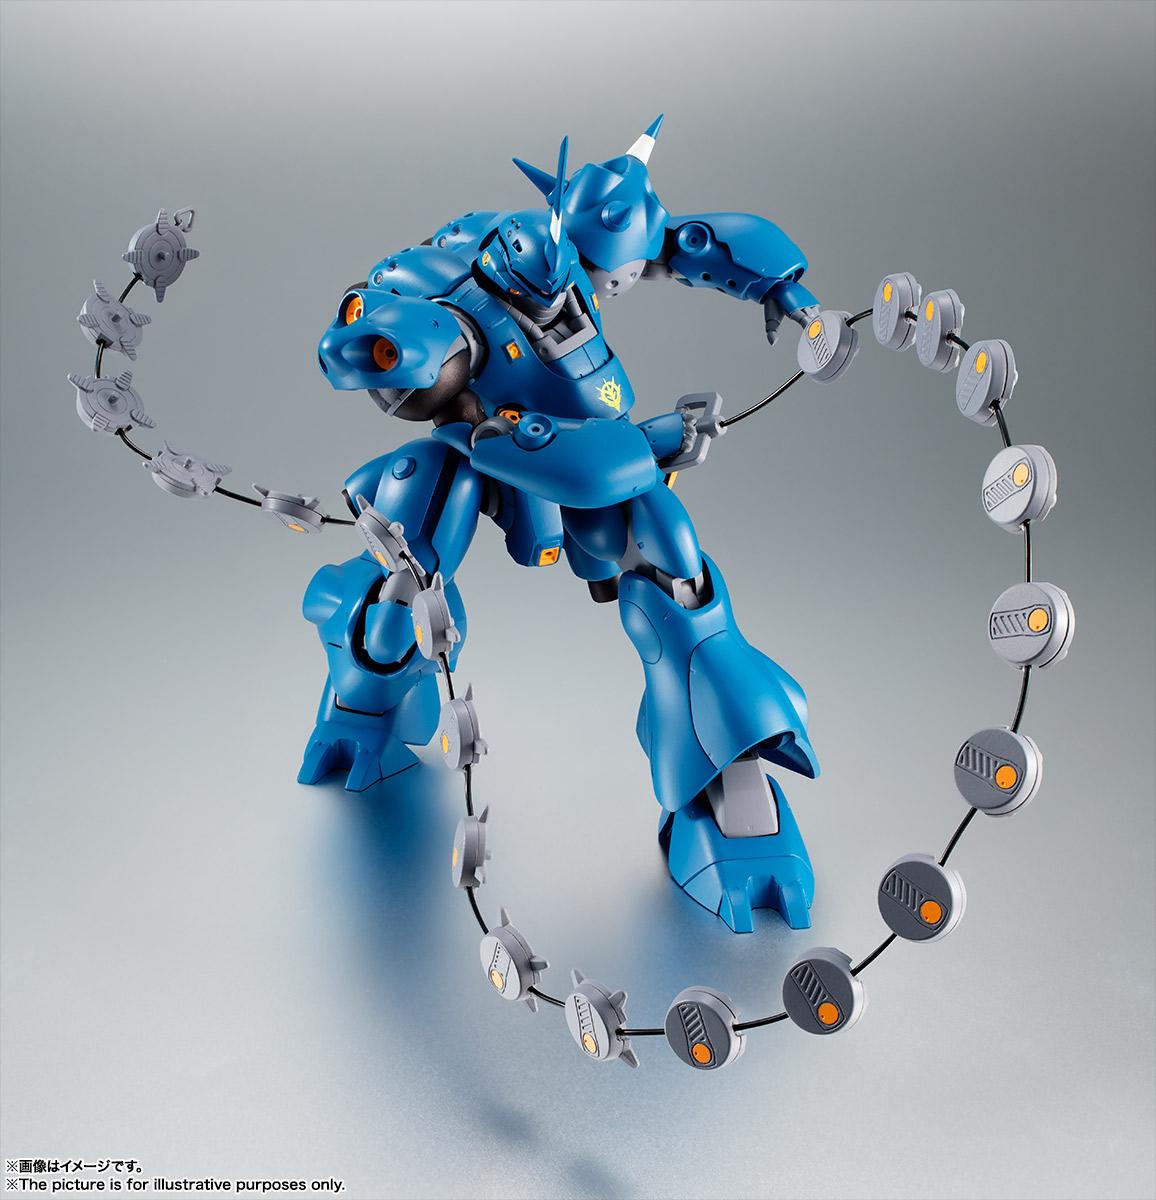 ROBOT魂〈SIDE MS〉『MS-18E ケンプファー ver. A.N.I.M.E.』機動戦士ガンダム0080 ポケットの中の戦争 可動フィギュア-005